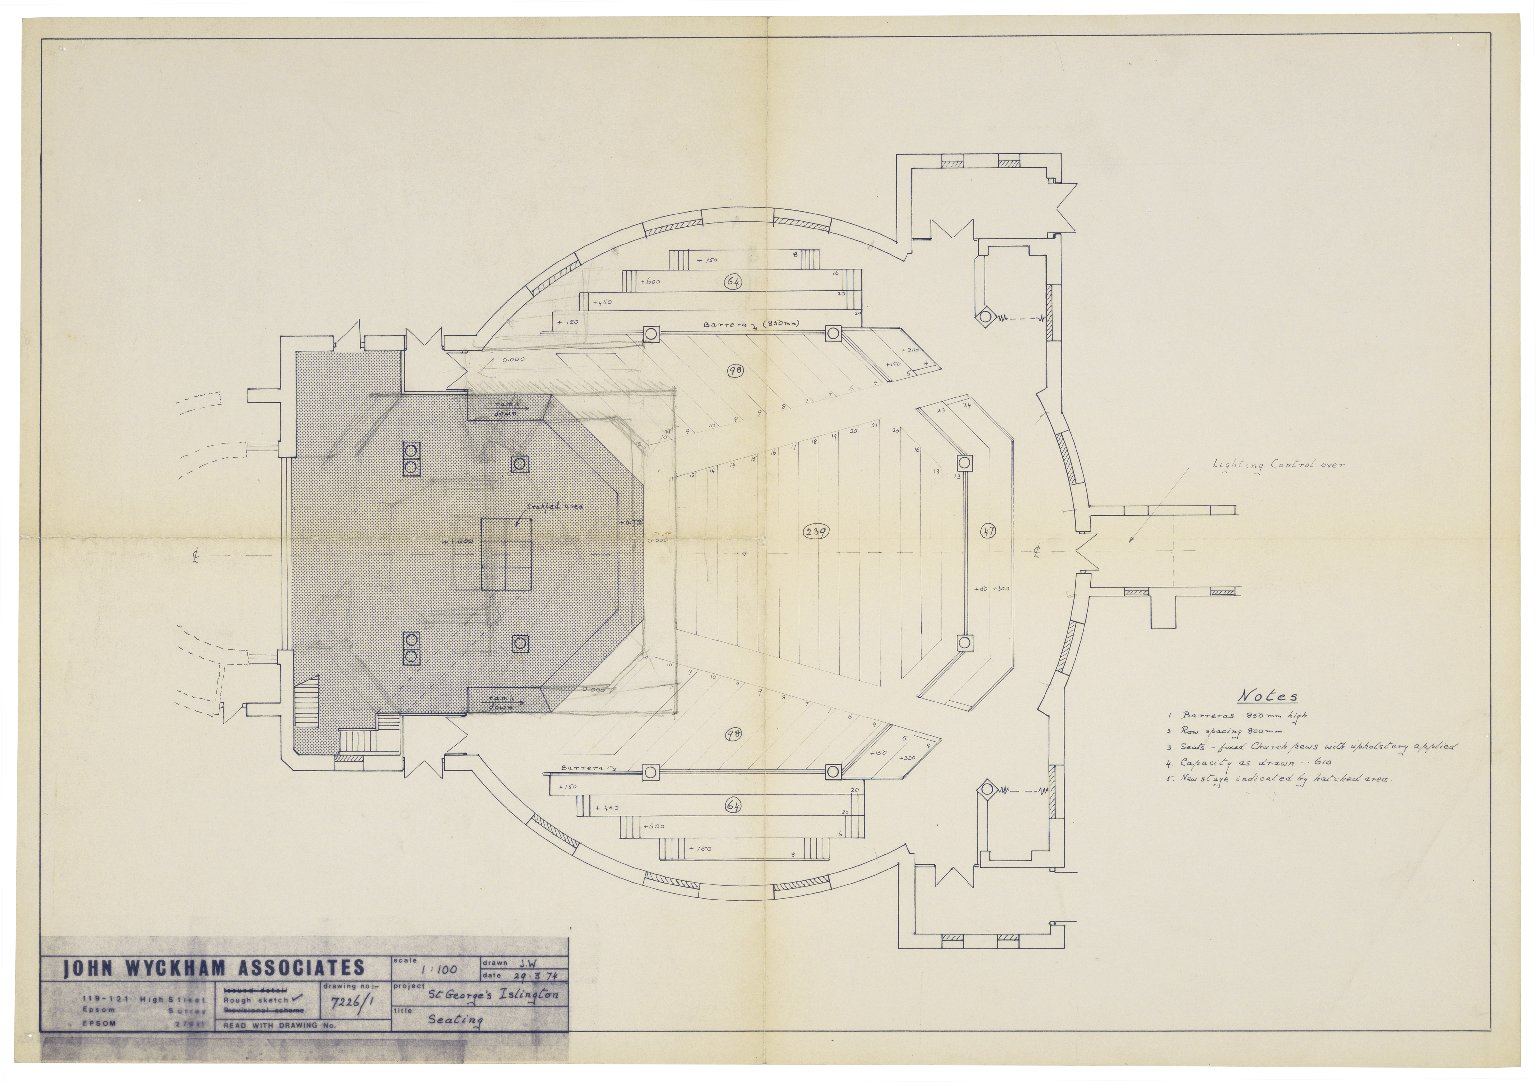 St. Georges Theatre, seating plan, Wyckham Assoc.